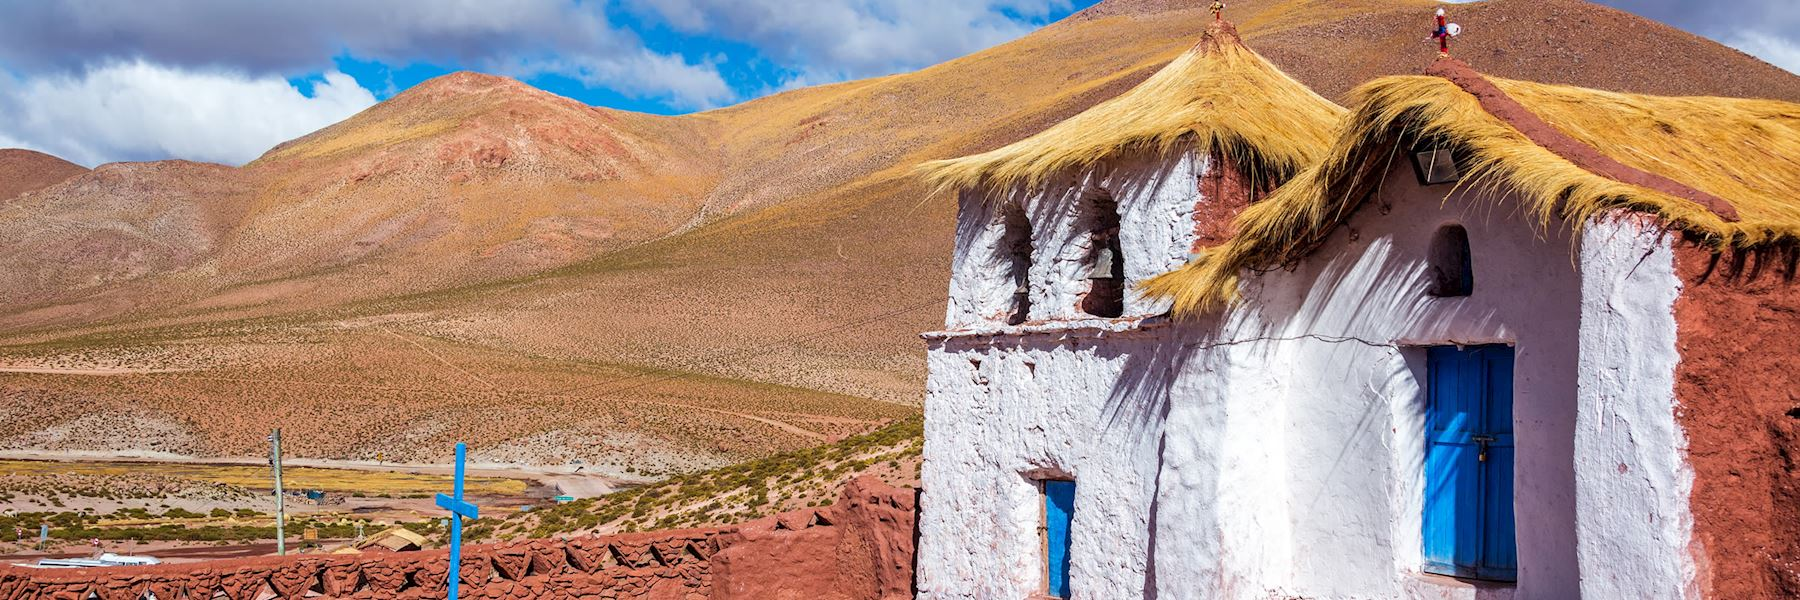 Visit San Pedro de Atacama, Chile